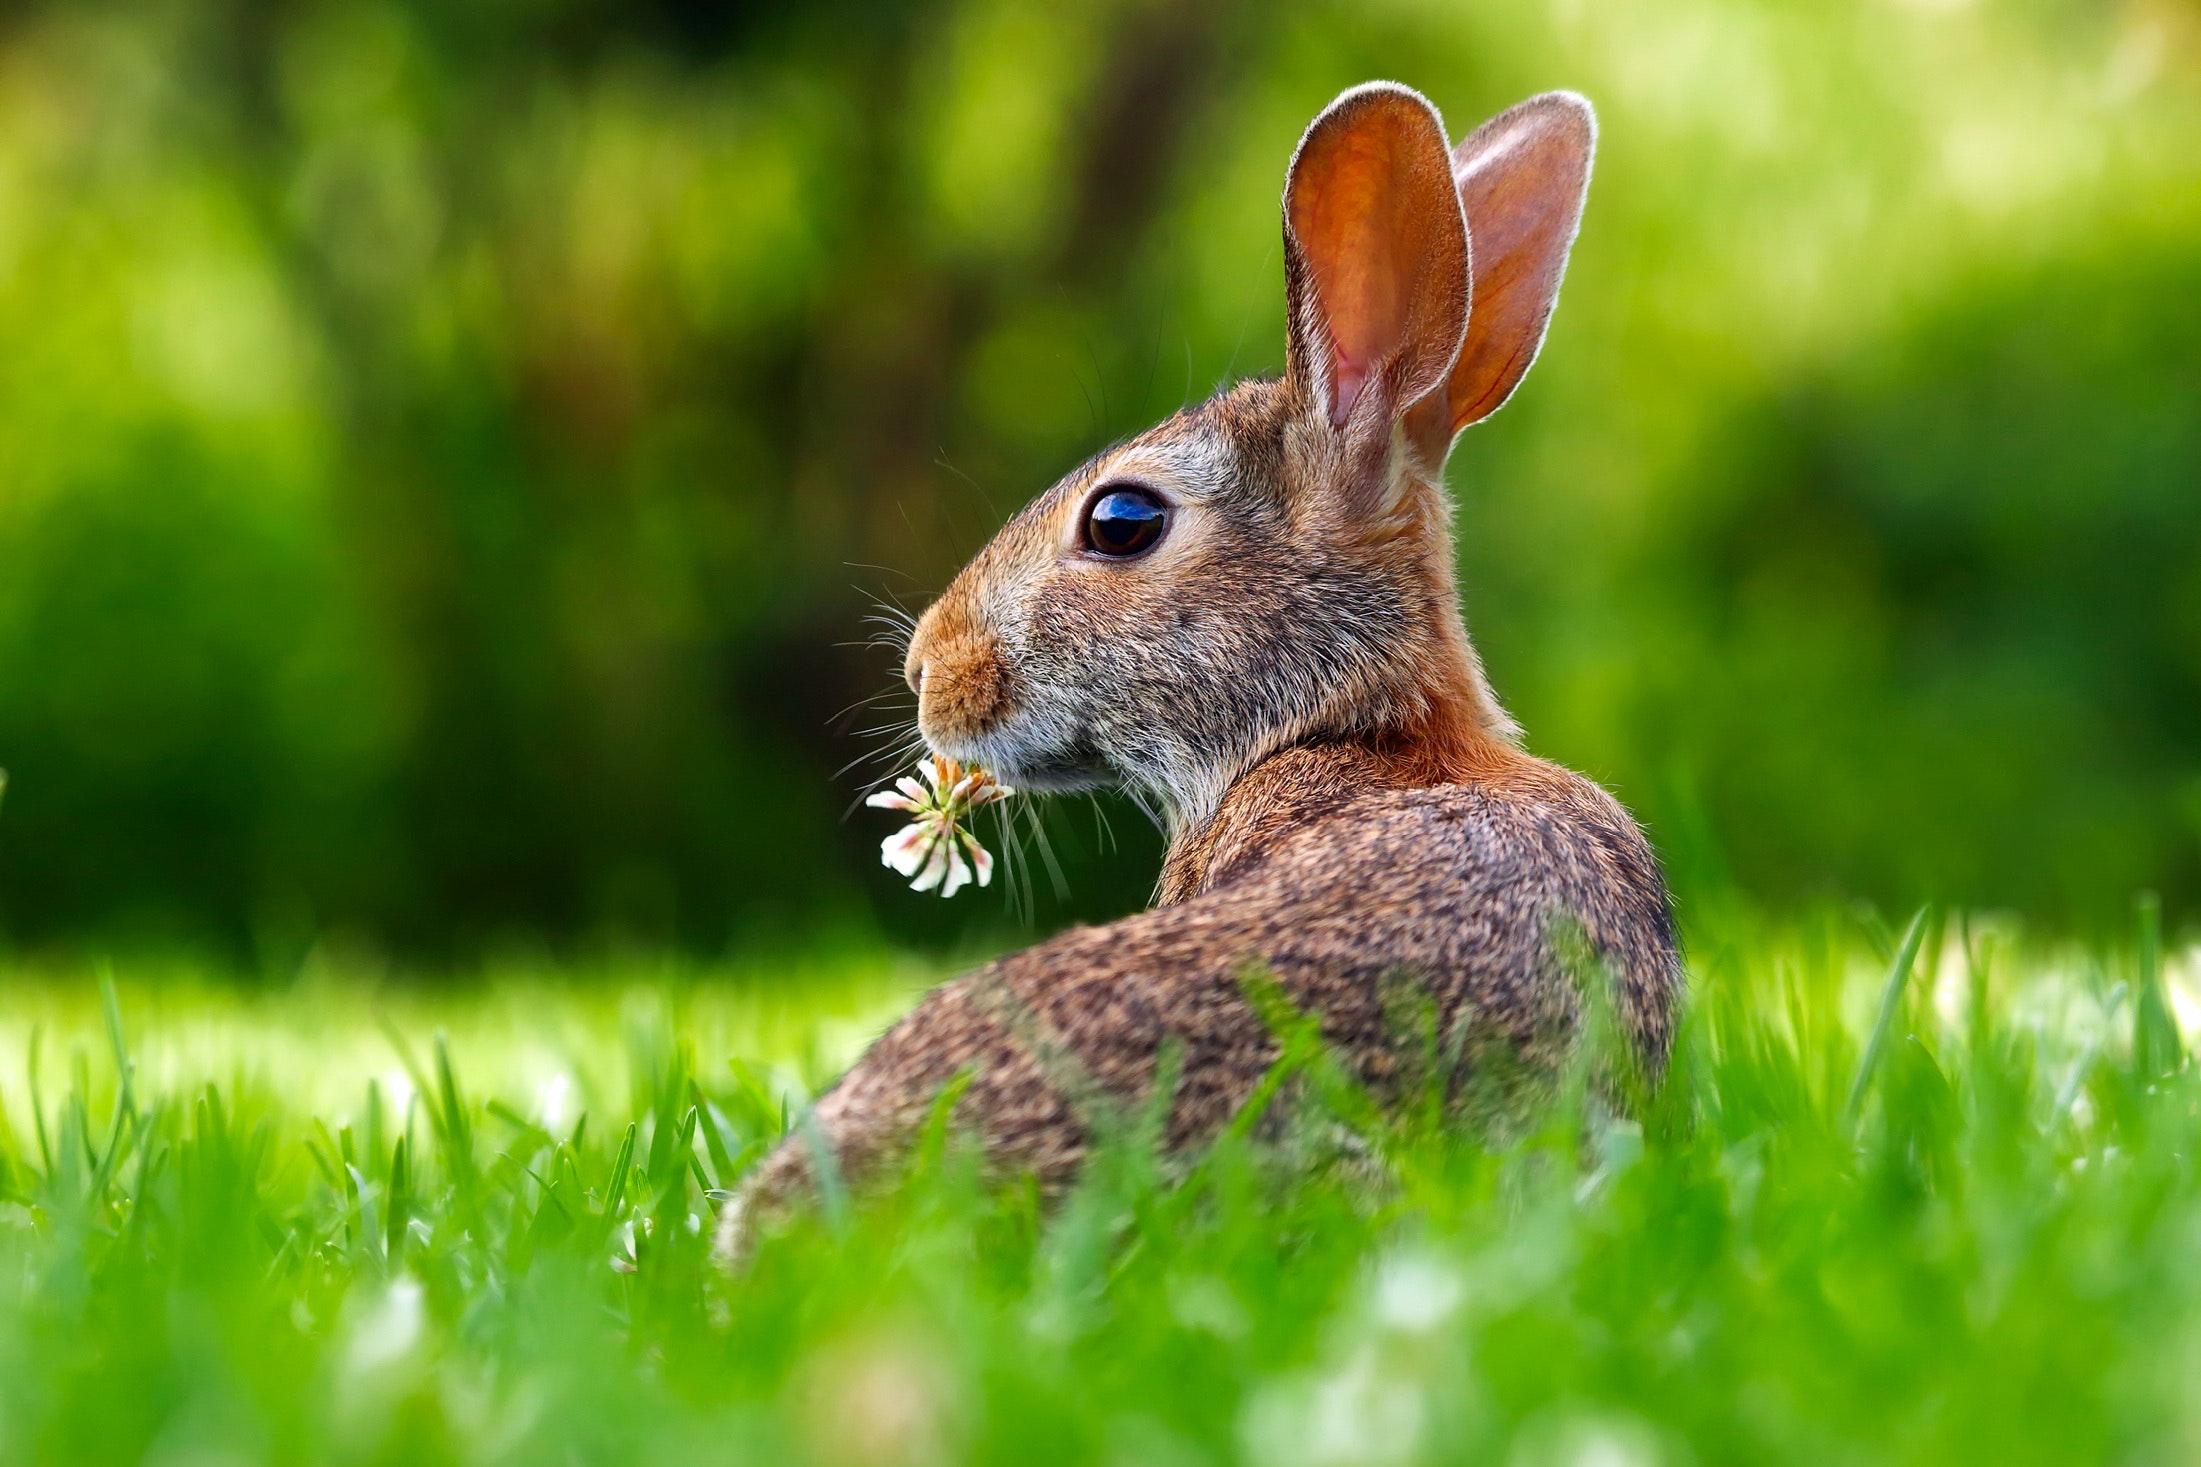 is a rabbit a herbivore